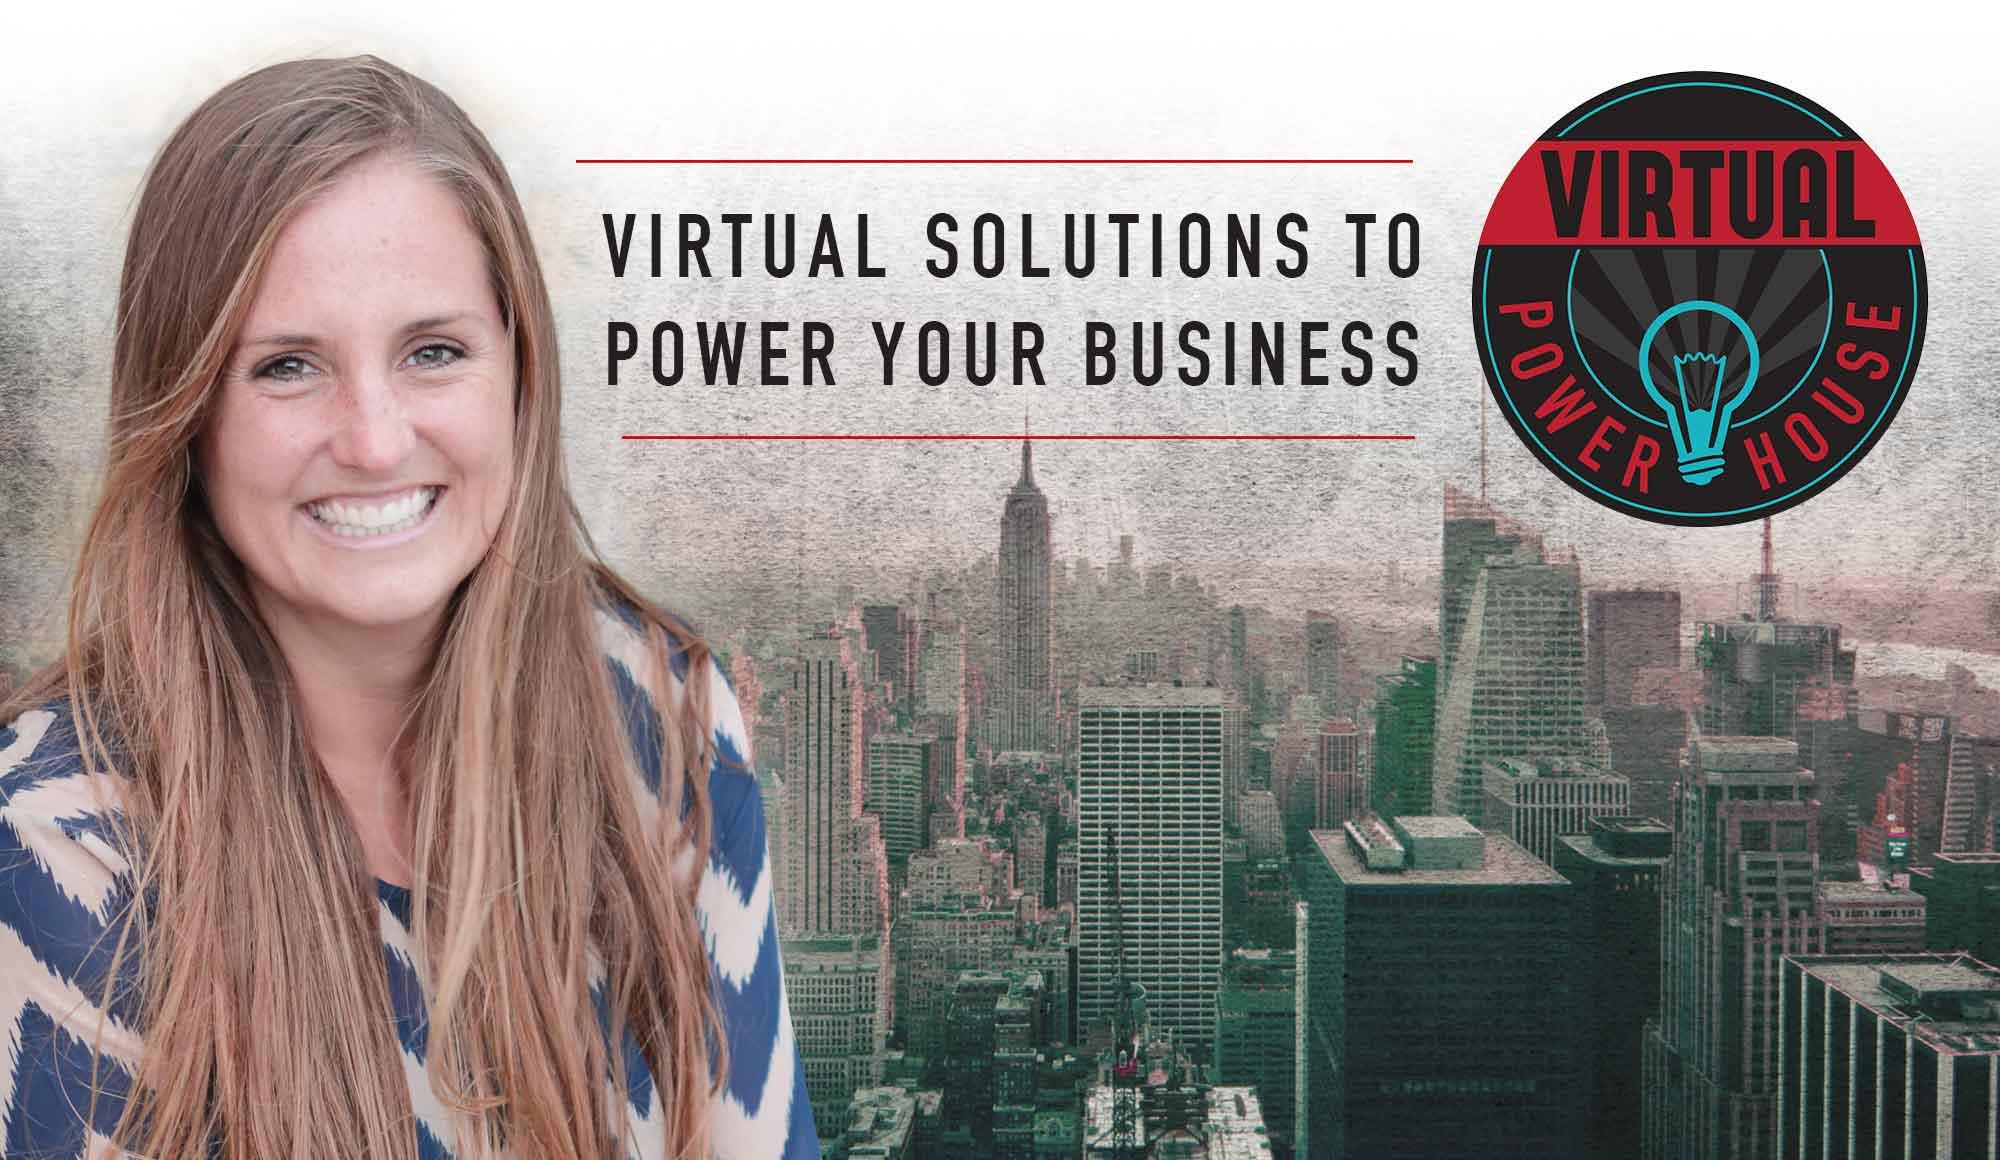 Virtual-powerhouse-header